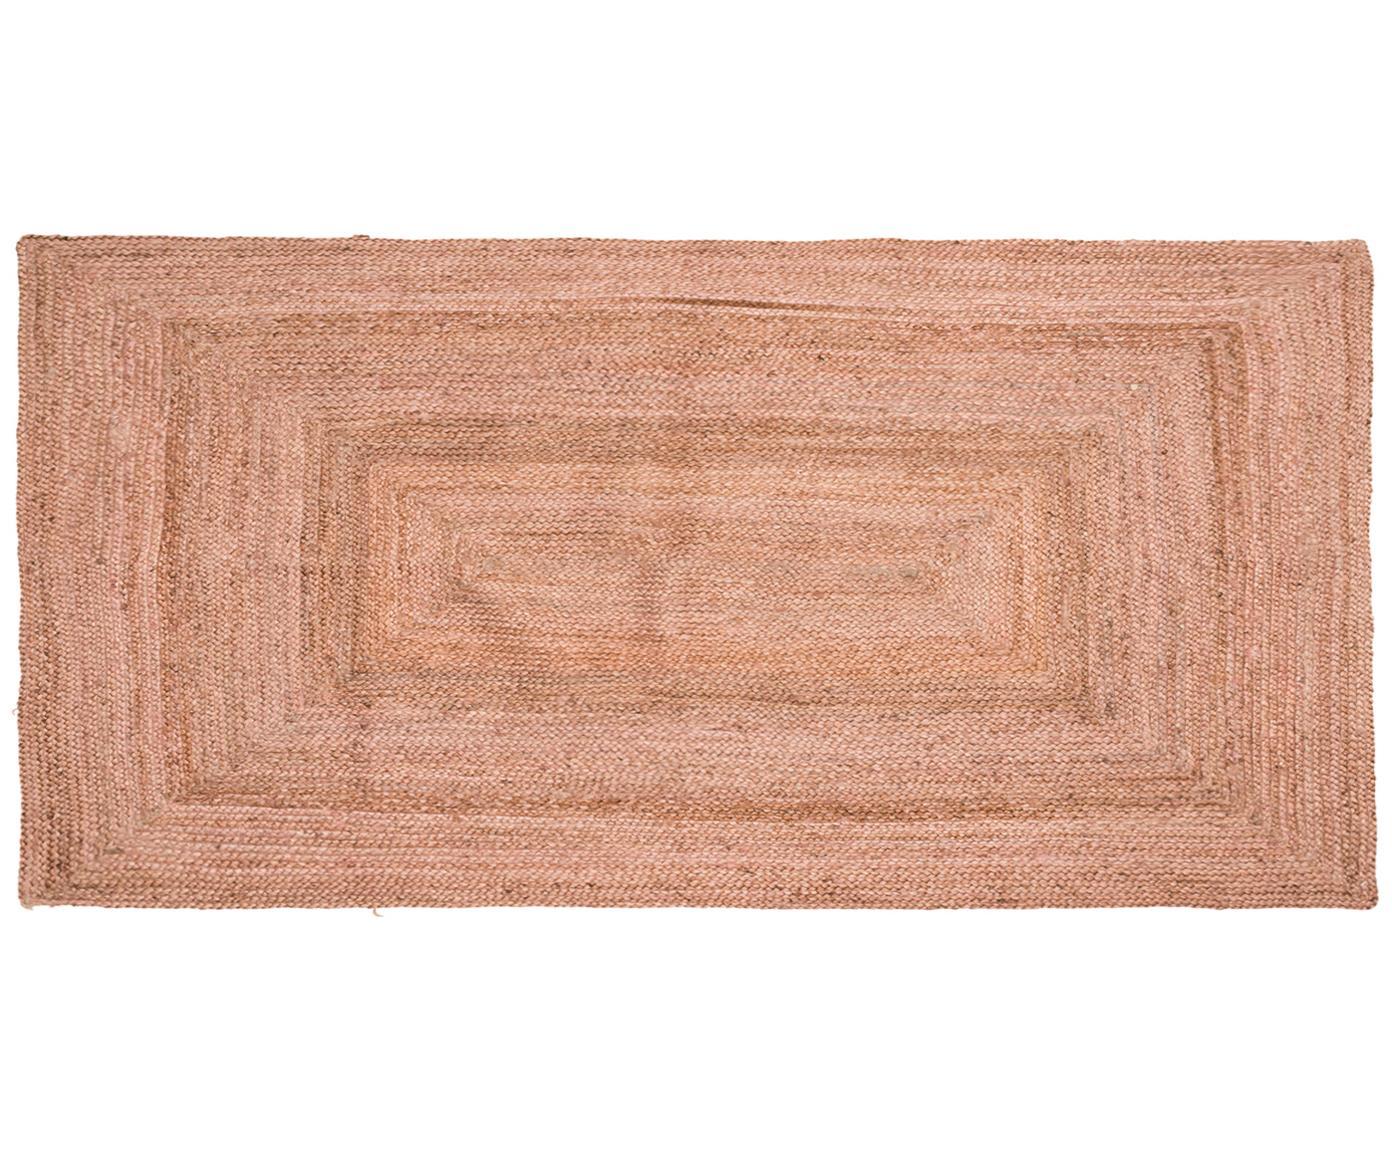 Jute-Teppich Pampas in Hellrosa, 100% Jute, Hellrosa, B 60 x L 120 cm (Grösse XS)